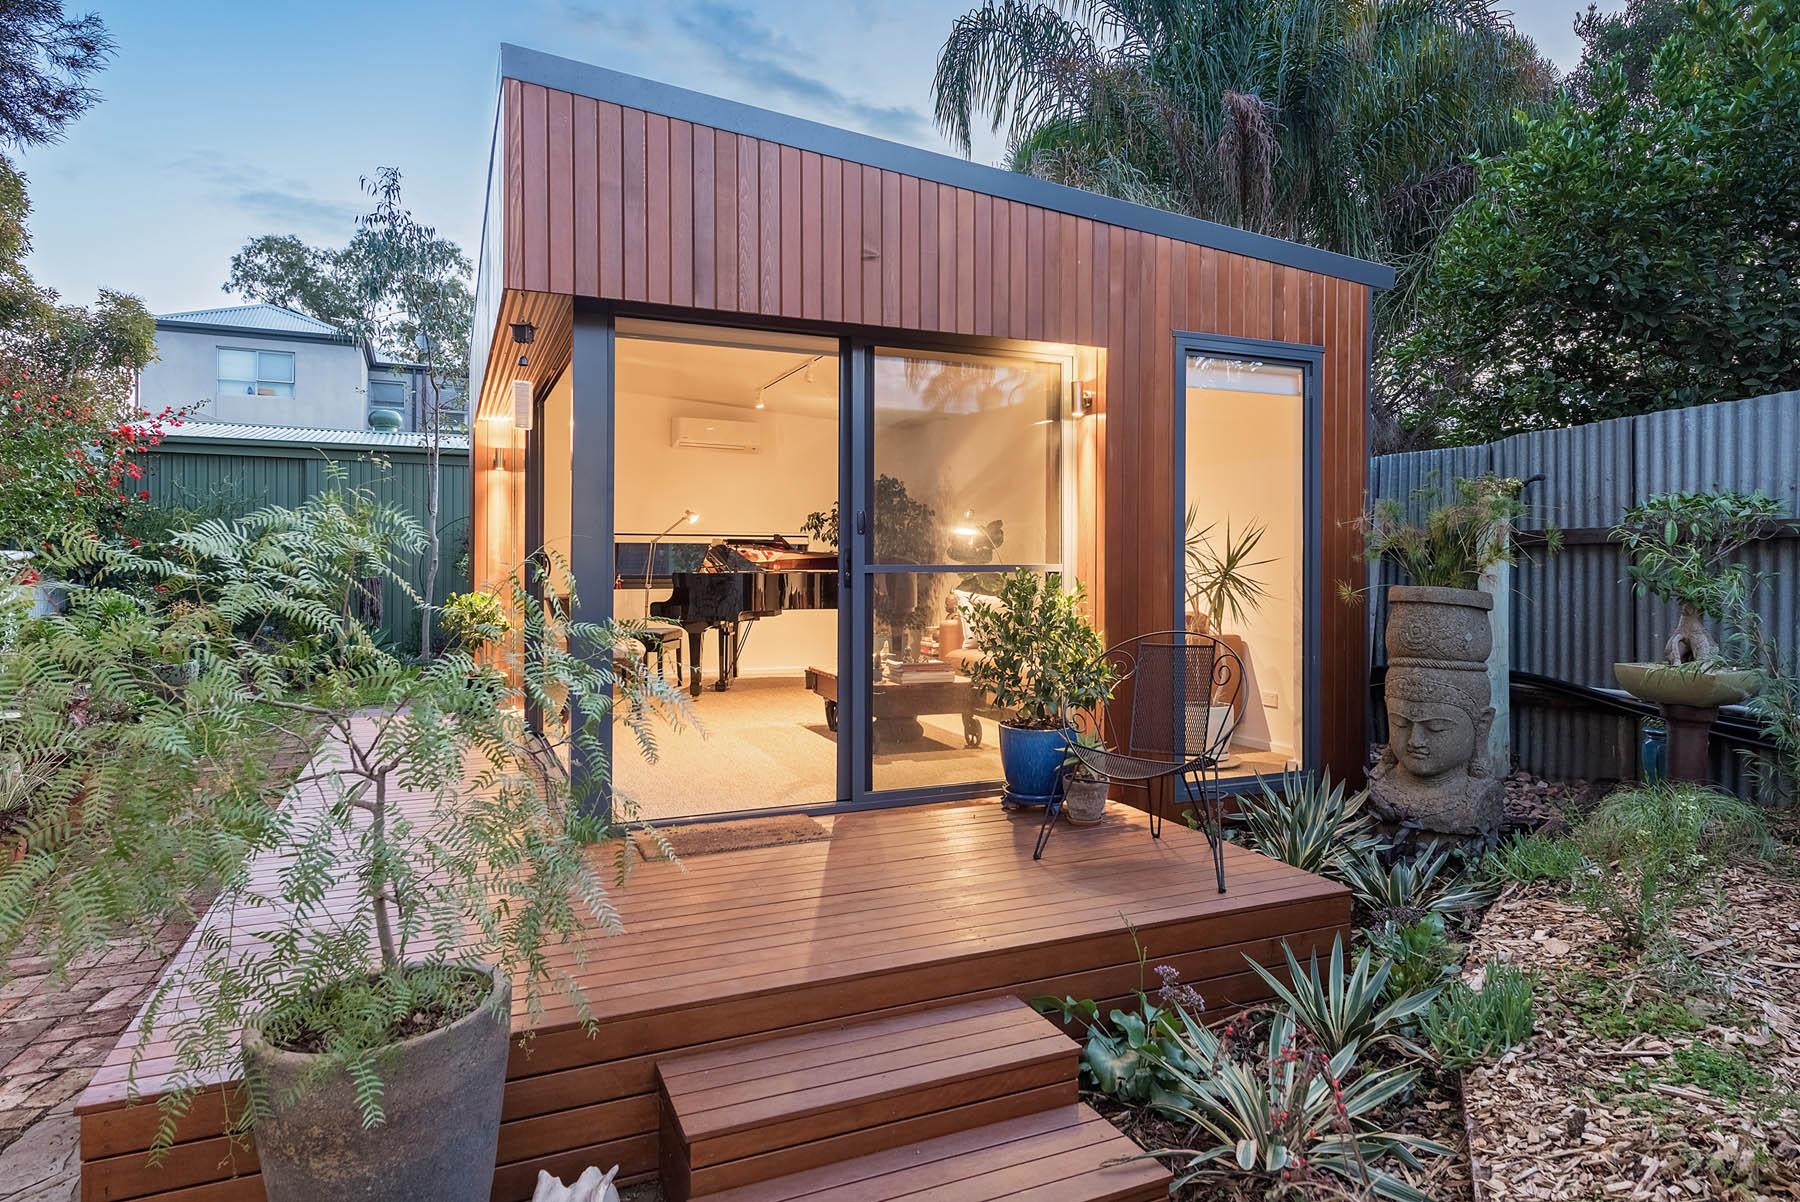 Carpenter, Landscaper, Builder? Modern Prefab Modular Outdoor Rooms Opportunity